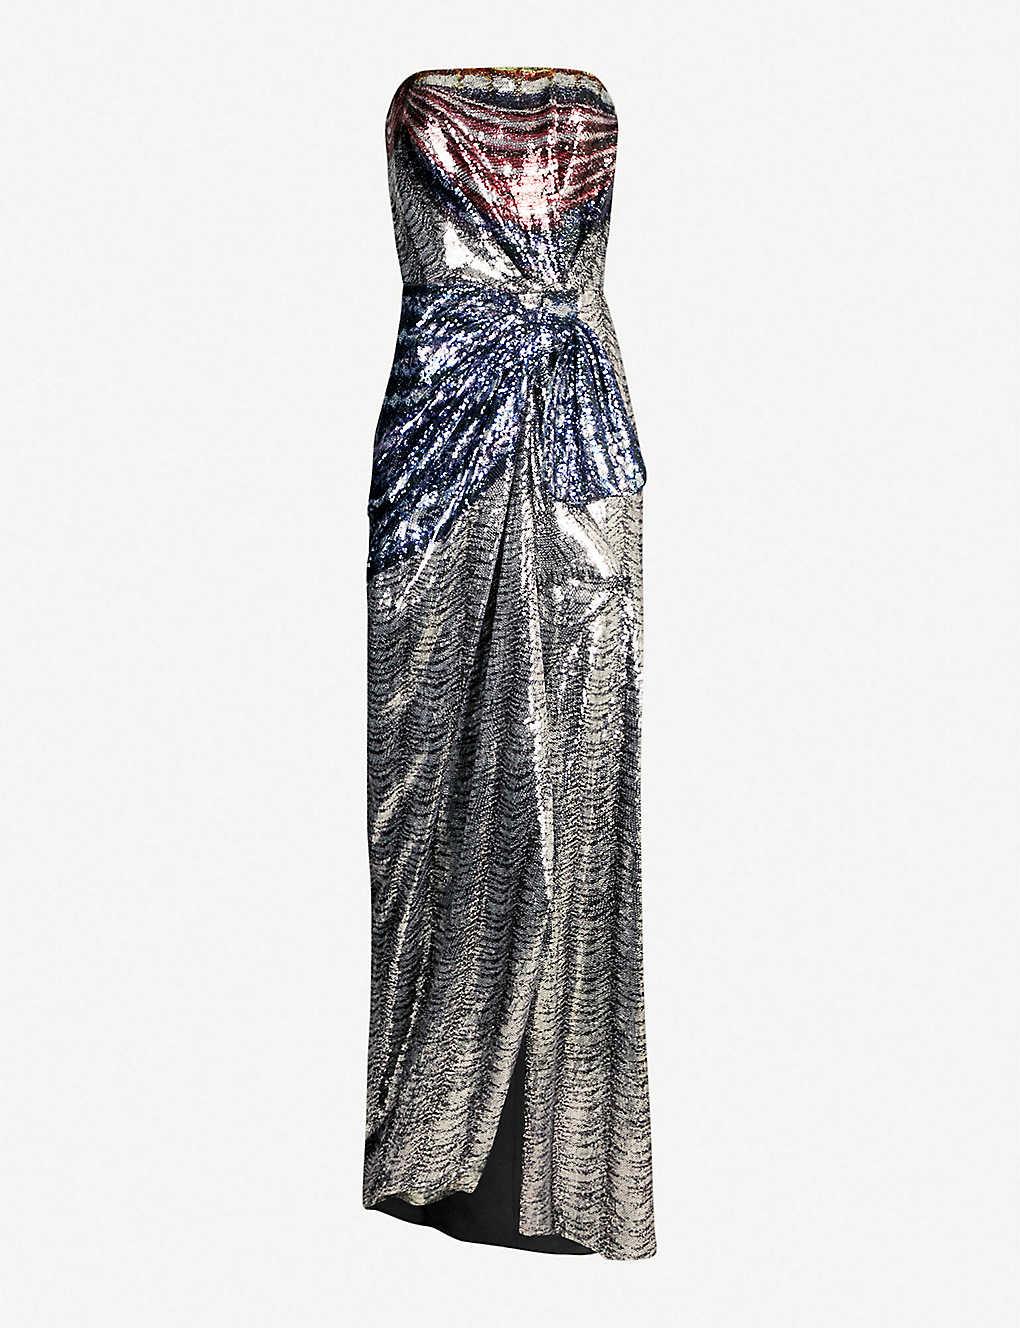 bda7c144c9e MARY KATRANTZOU - Consort strapless sequinned gown